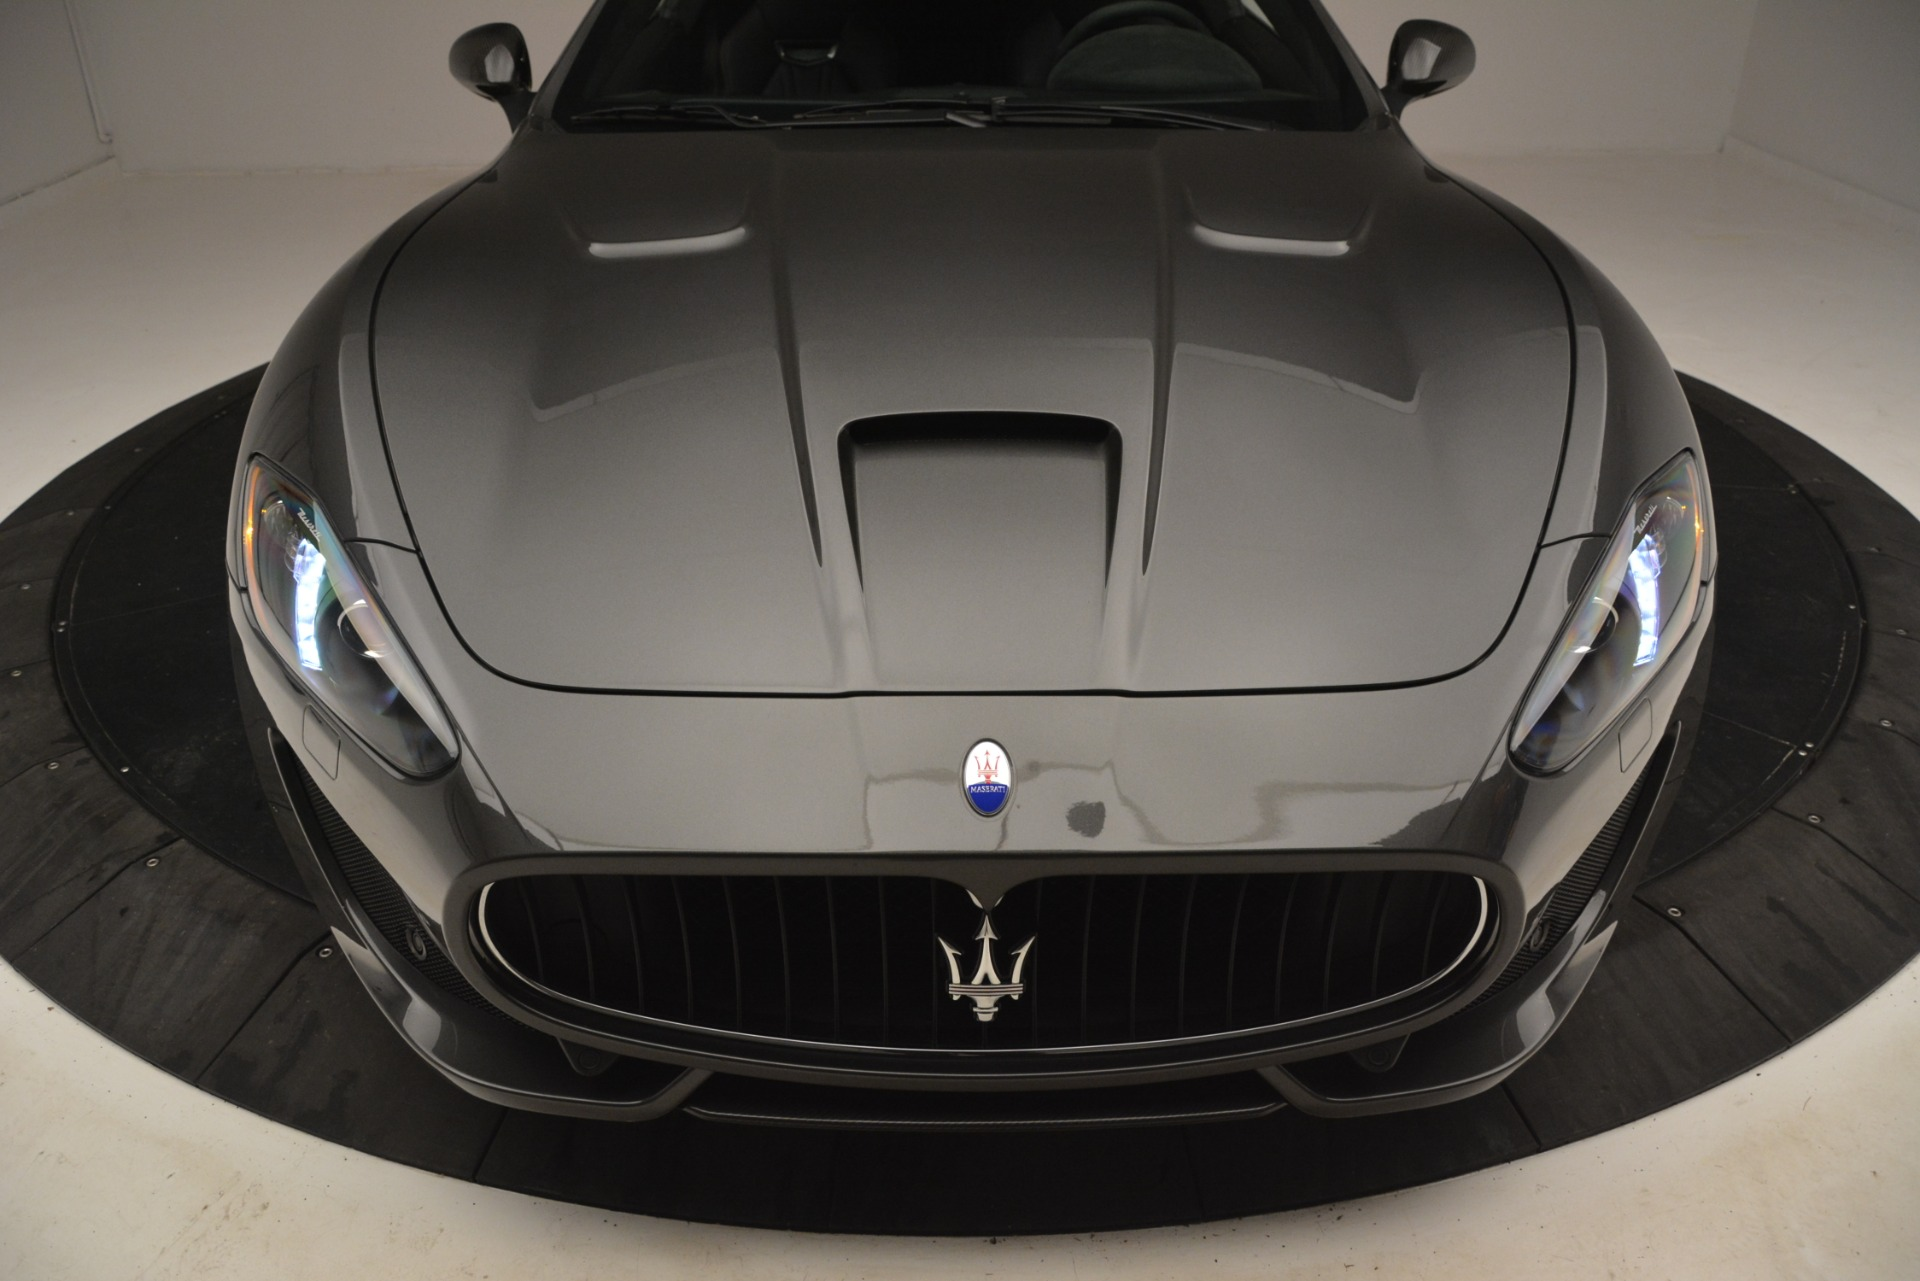 Used 2017 Maserati GranTurismo GT Sport Special Edition For Sale In Greenwich, CT 665_p23